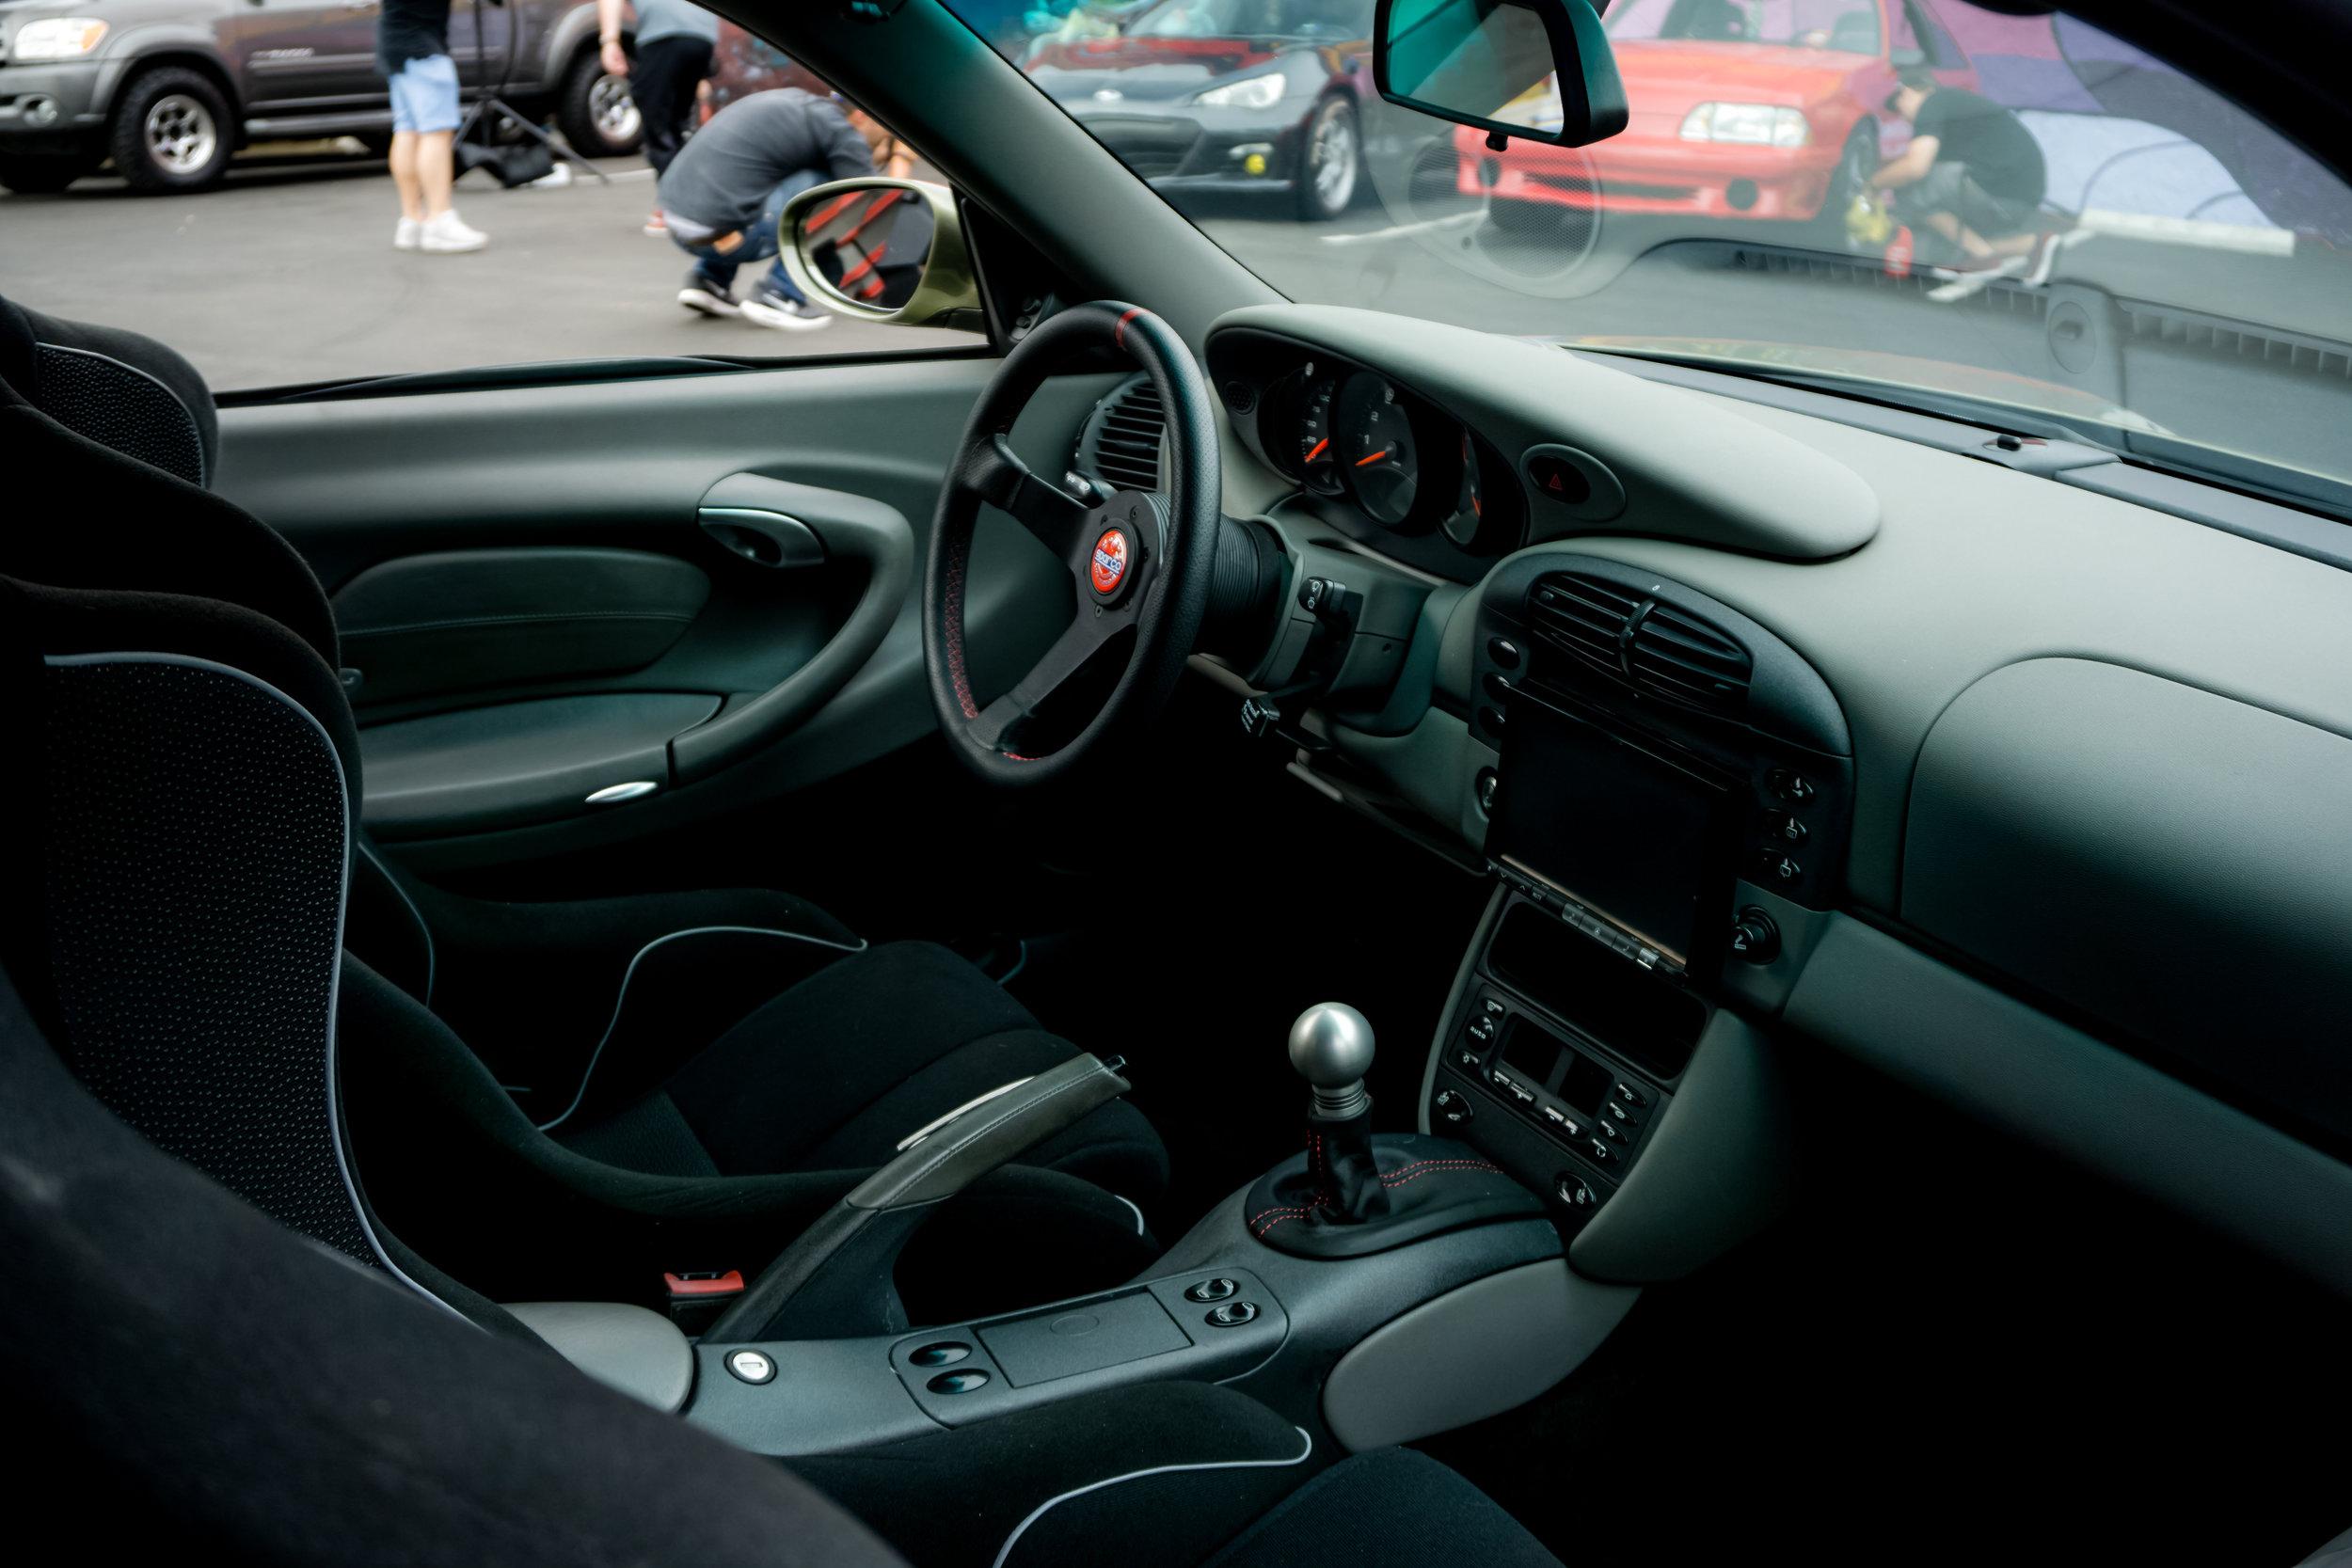 CNCPics_Porsche_911DV8_Interior.jpg